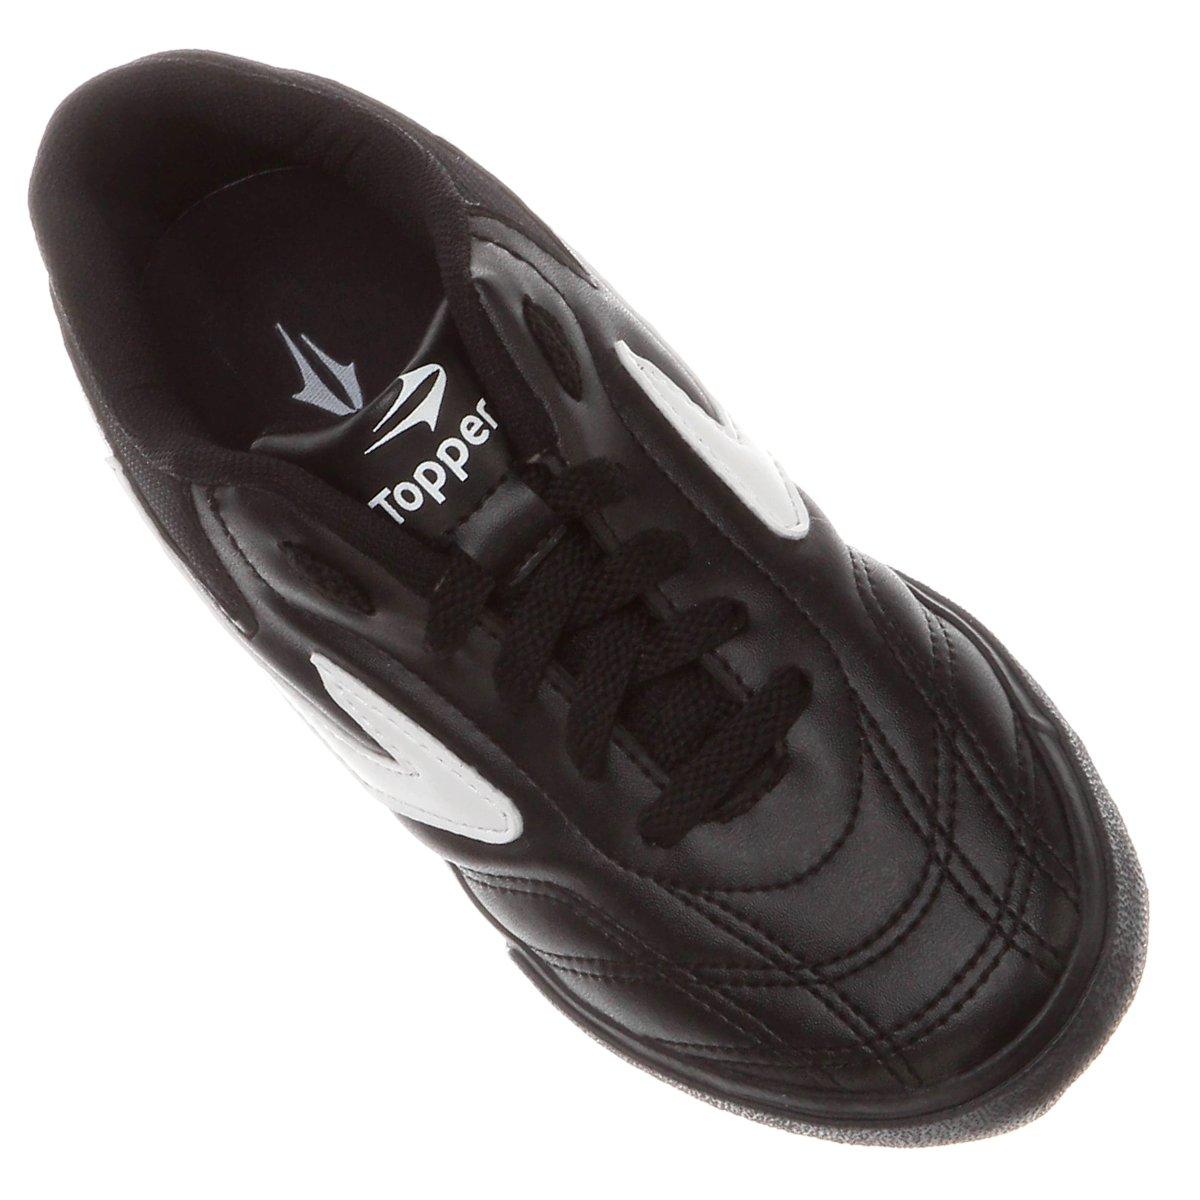 Chuteira Topper Dominator 3 Futsal Infantil - Preto e Branco ... 72a8f5e752403